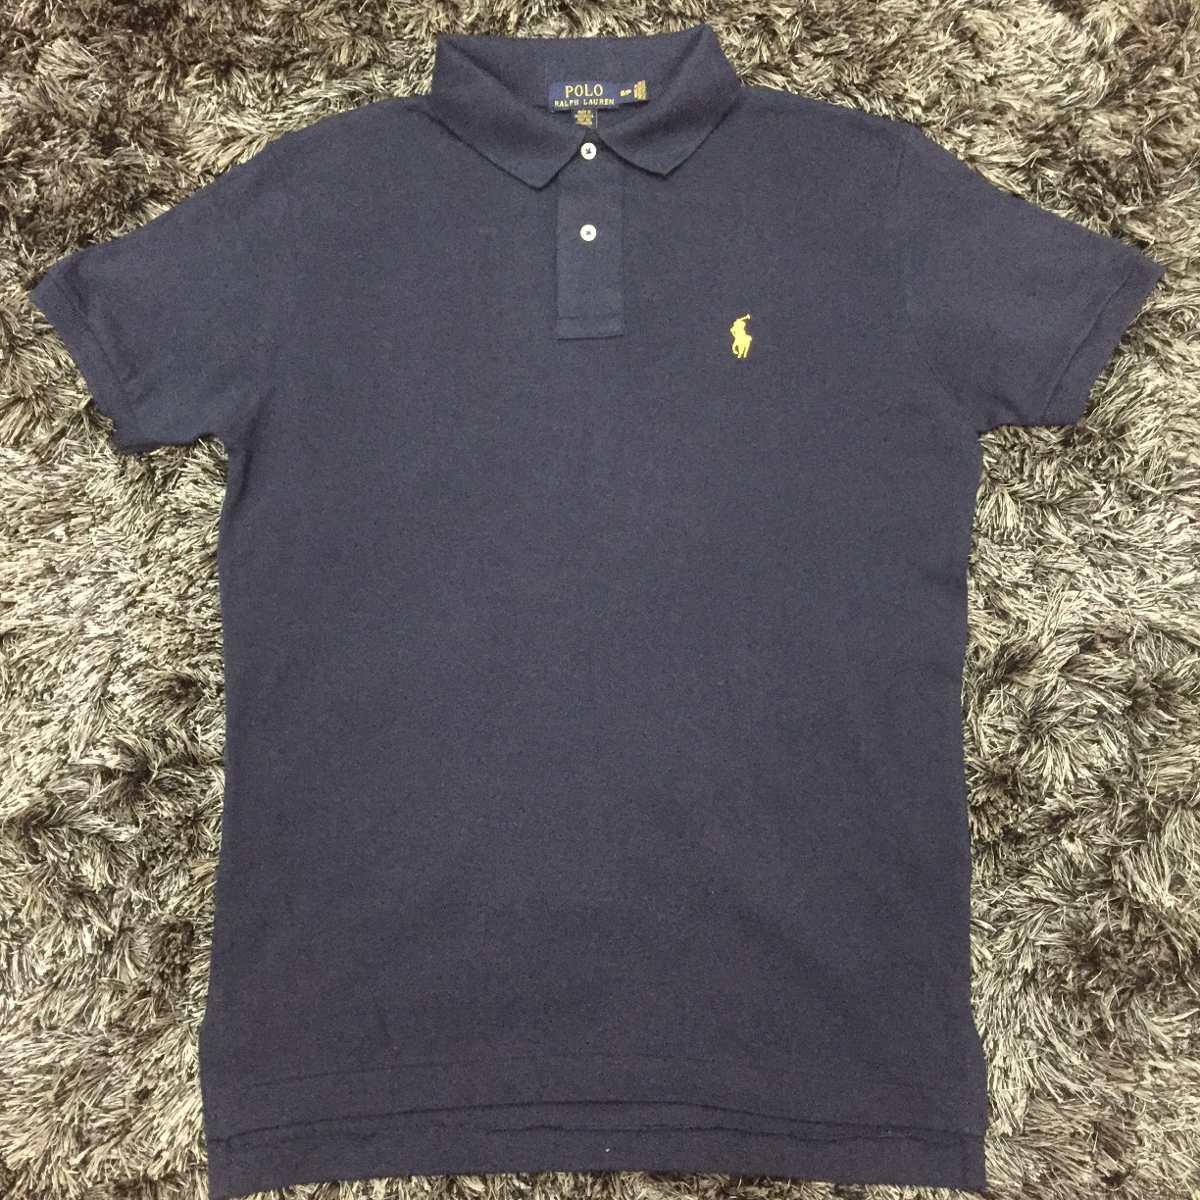 dbf1d1ad62432 Kit 10 Camisetas Polo Ralph Lauren